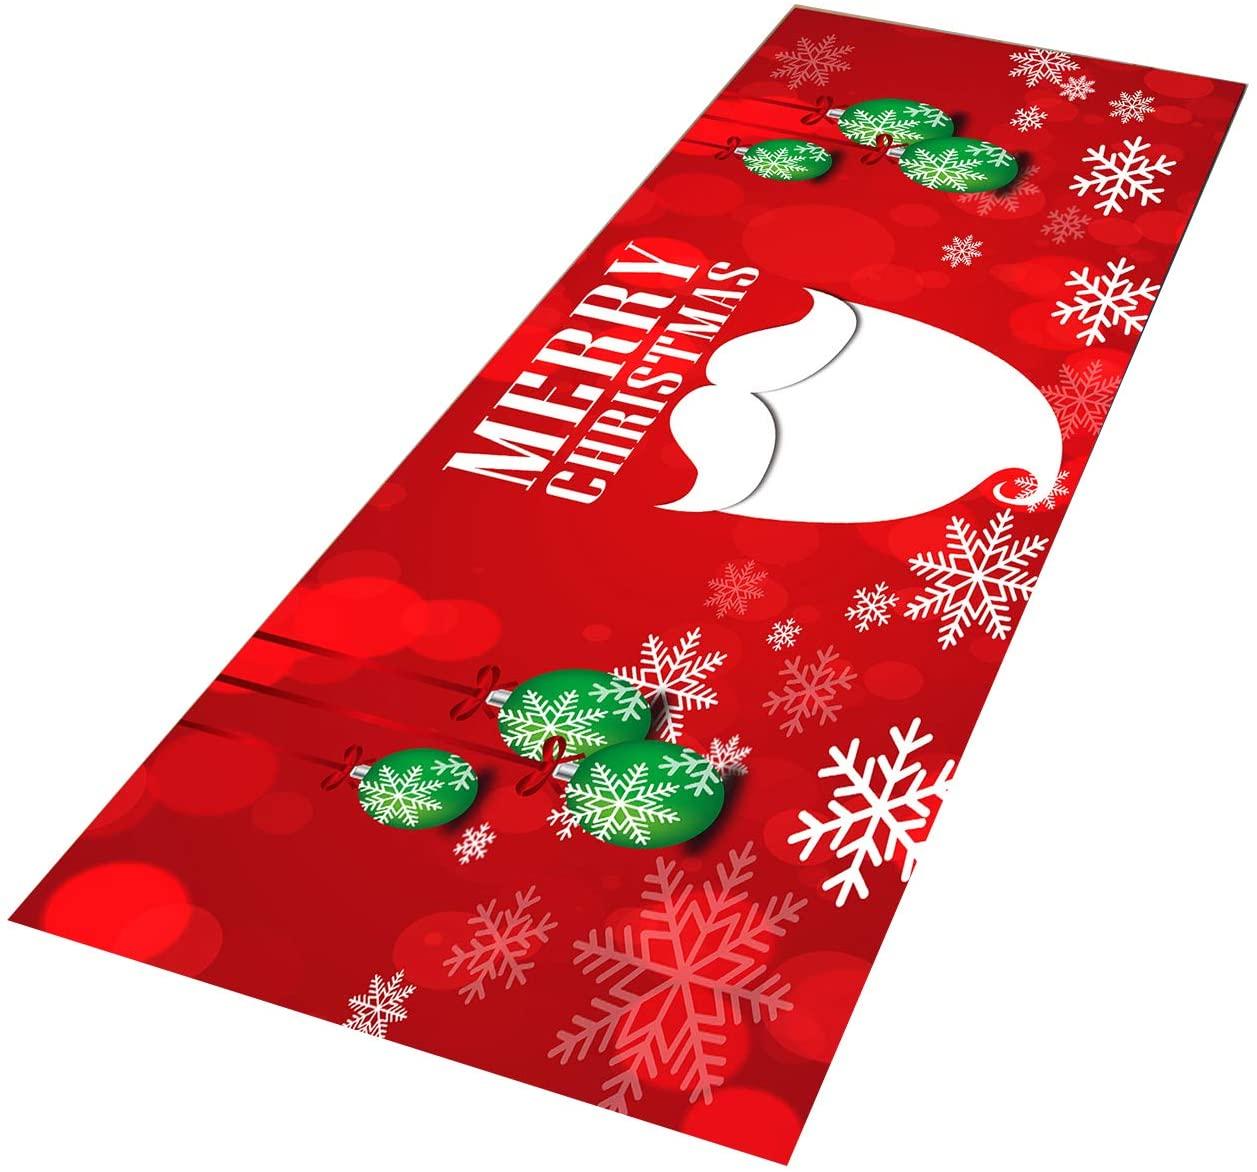 Crafttable 2 Pieces Merry Christmas Kitchen Rug Set, Anti-Fatigue Kitchen Floor Mat, Non Slip Standing Carpet, 15.7x23.6+ 15.7x47.2 in, 12